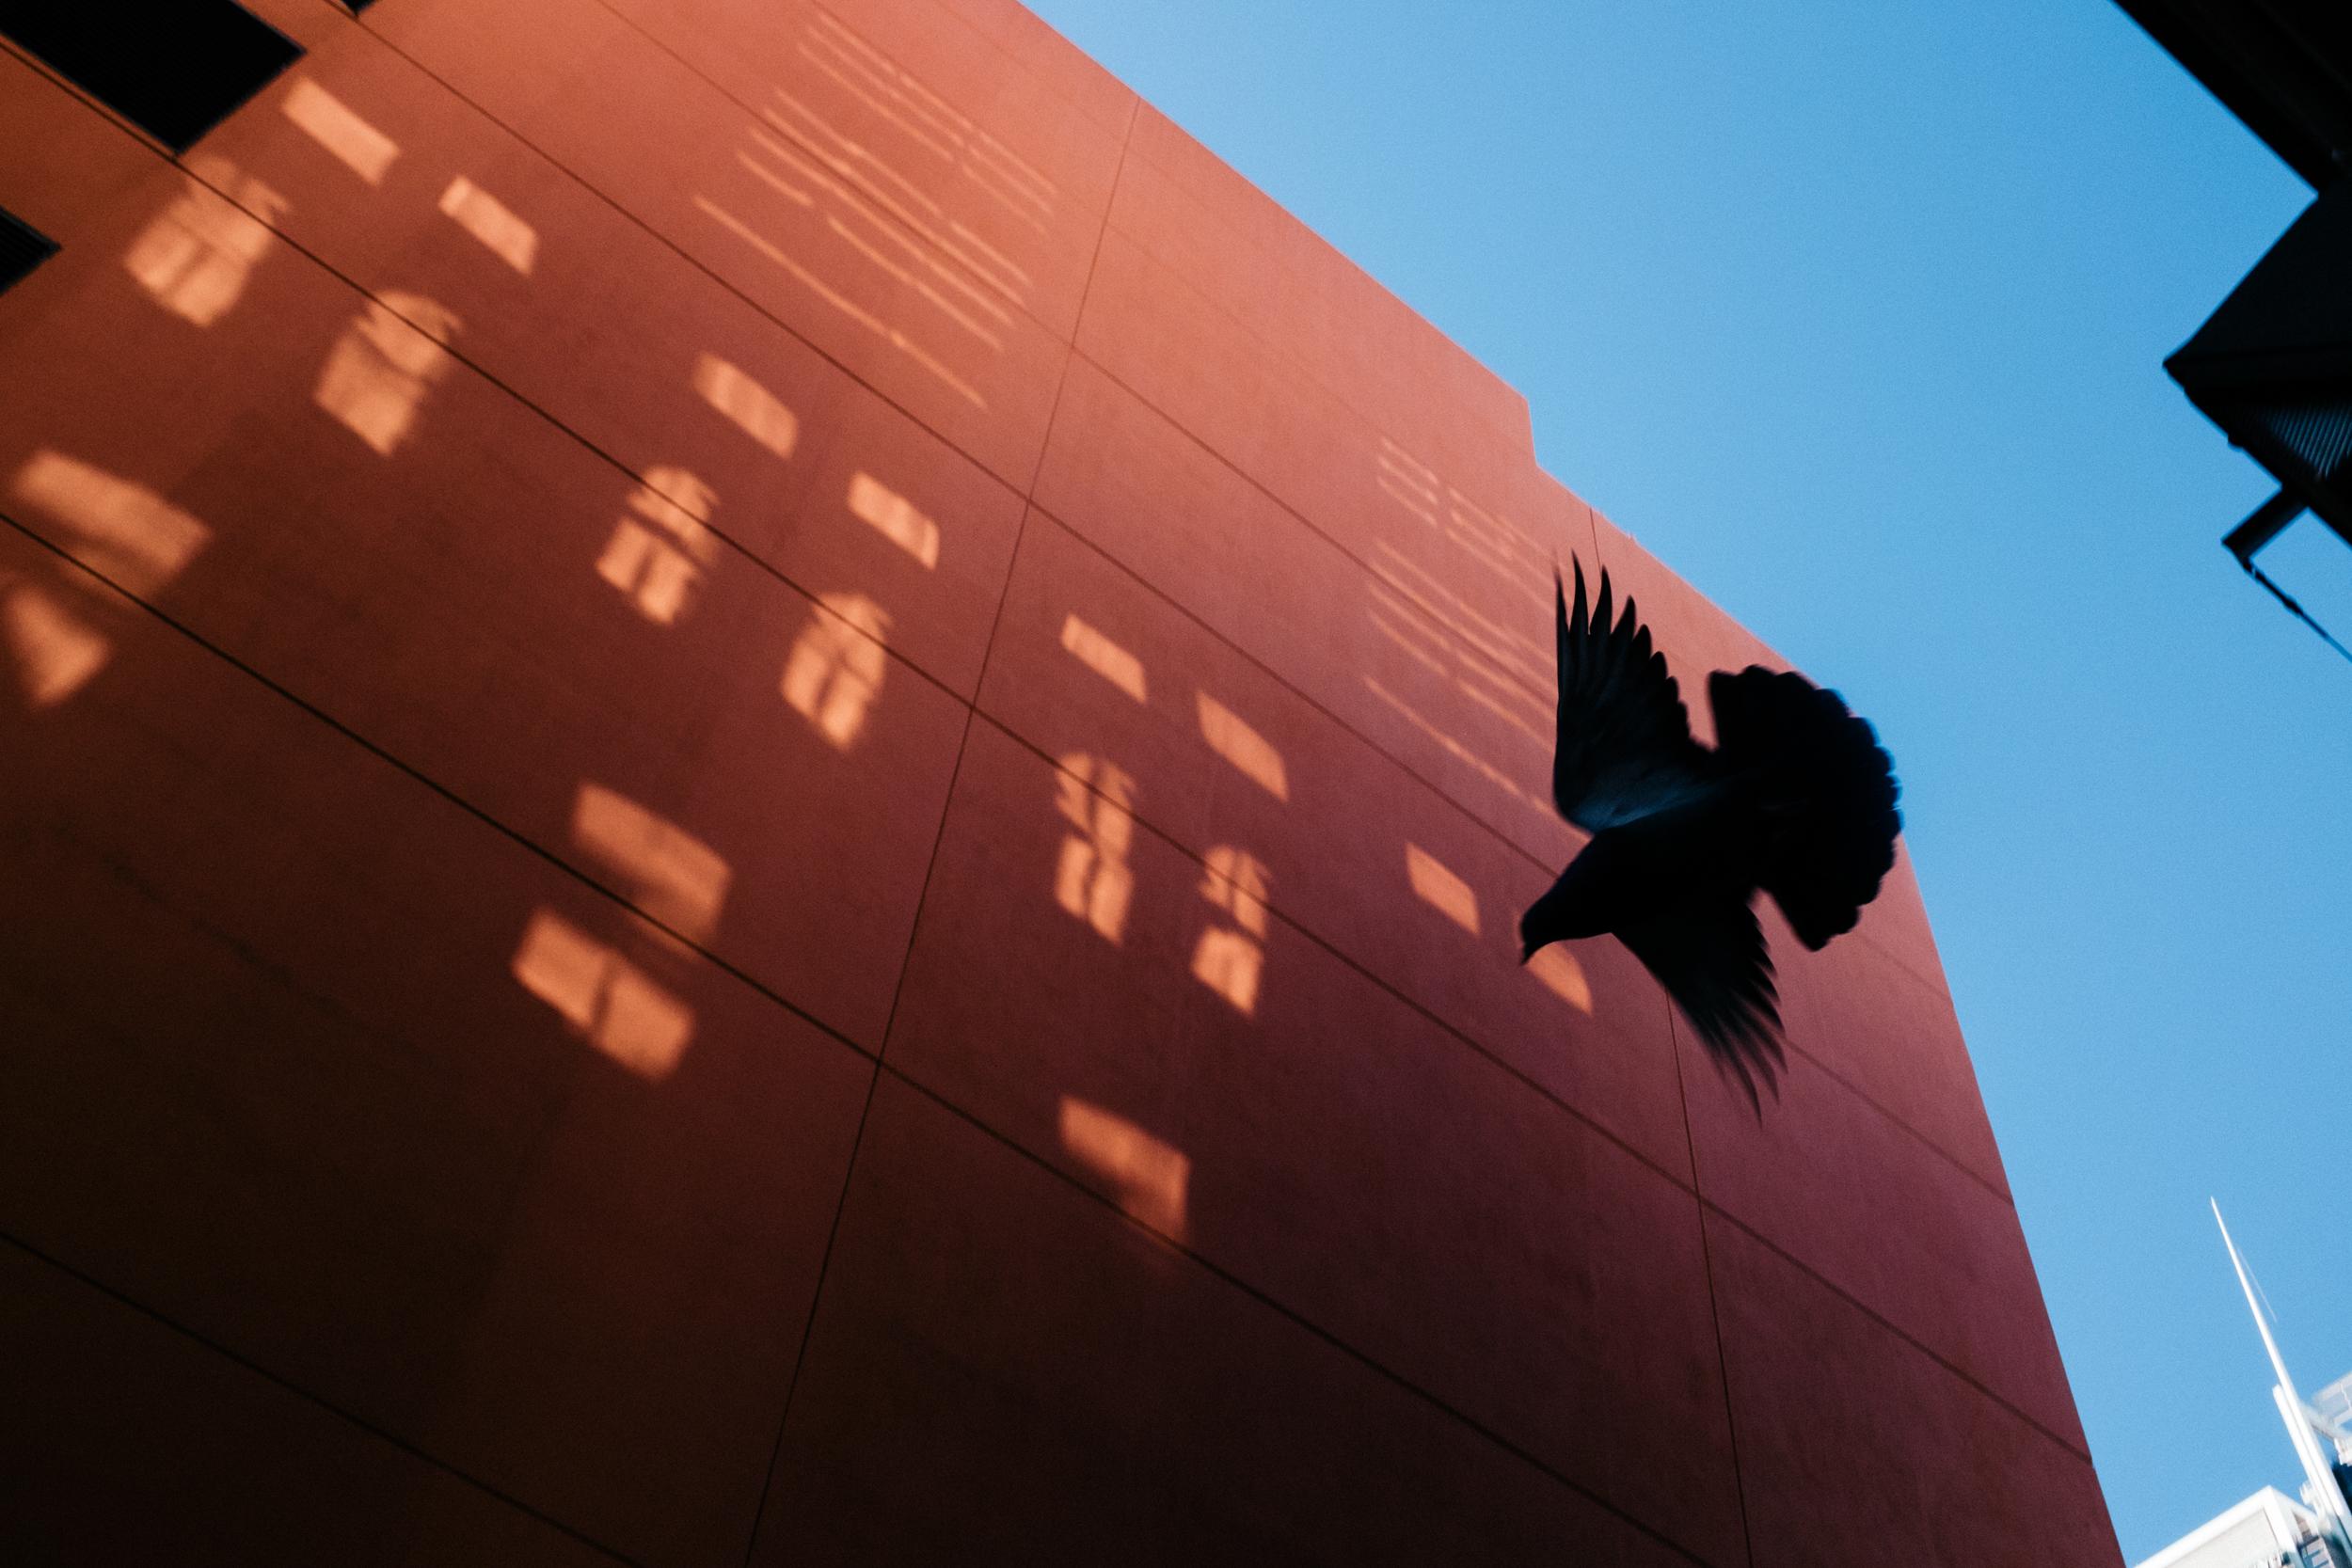 06_Jonathan_Pui_Australian_street_photography_pidgeon_reflective_light_aussie_street.JPG